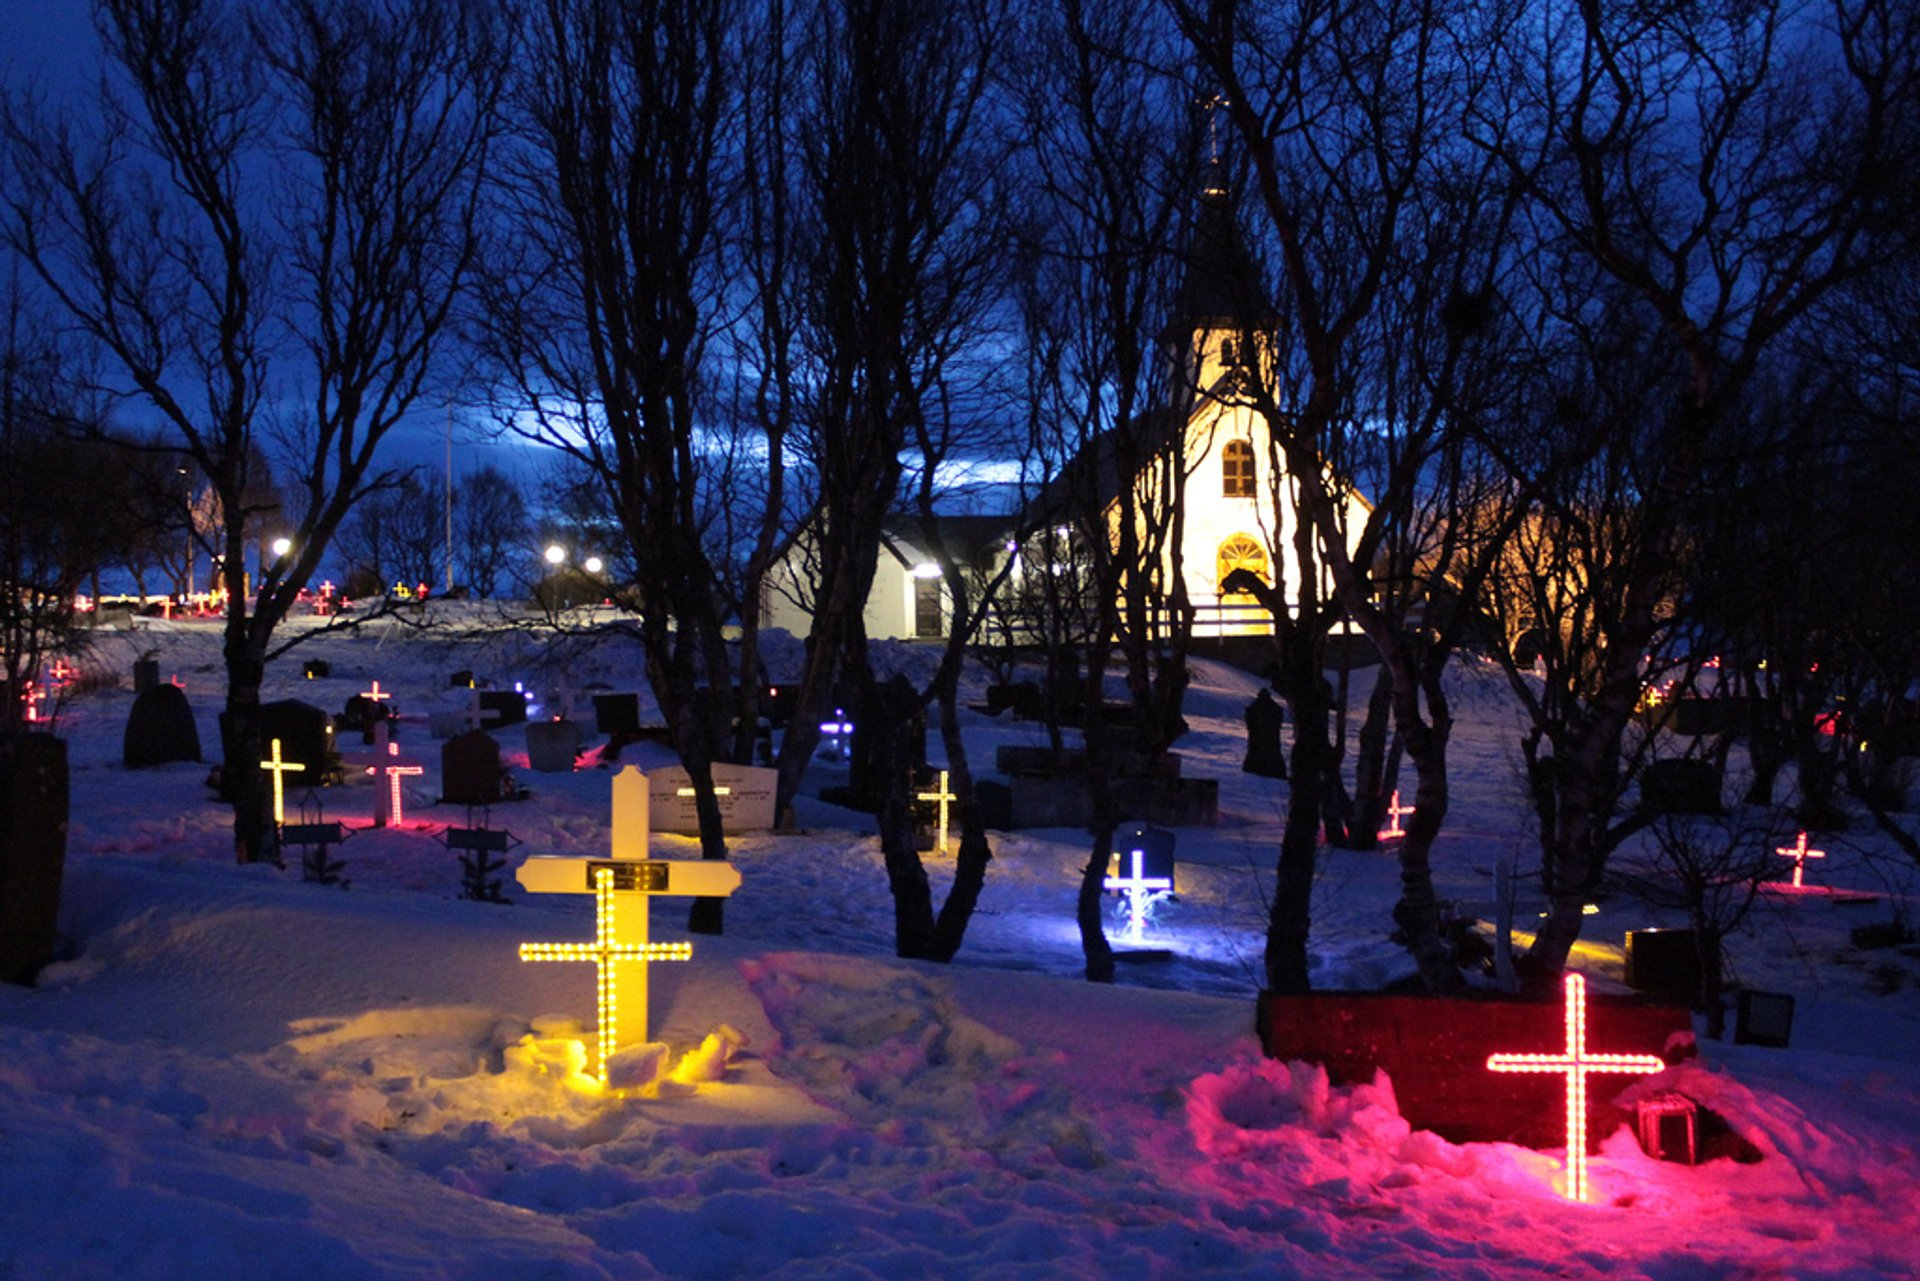 Illuminated Gravestones in Iceland 2019 - Best Time